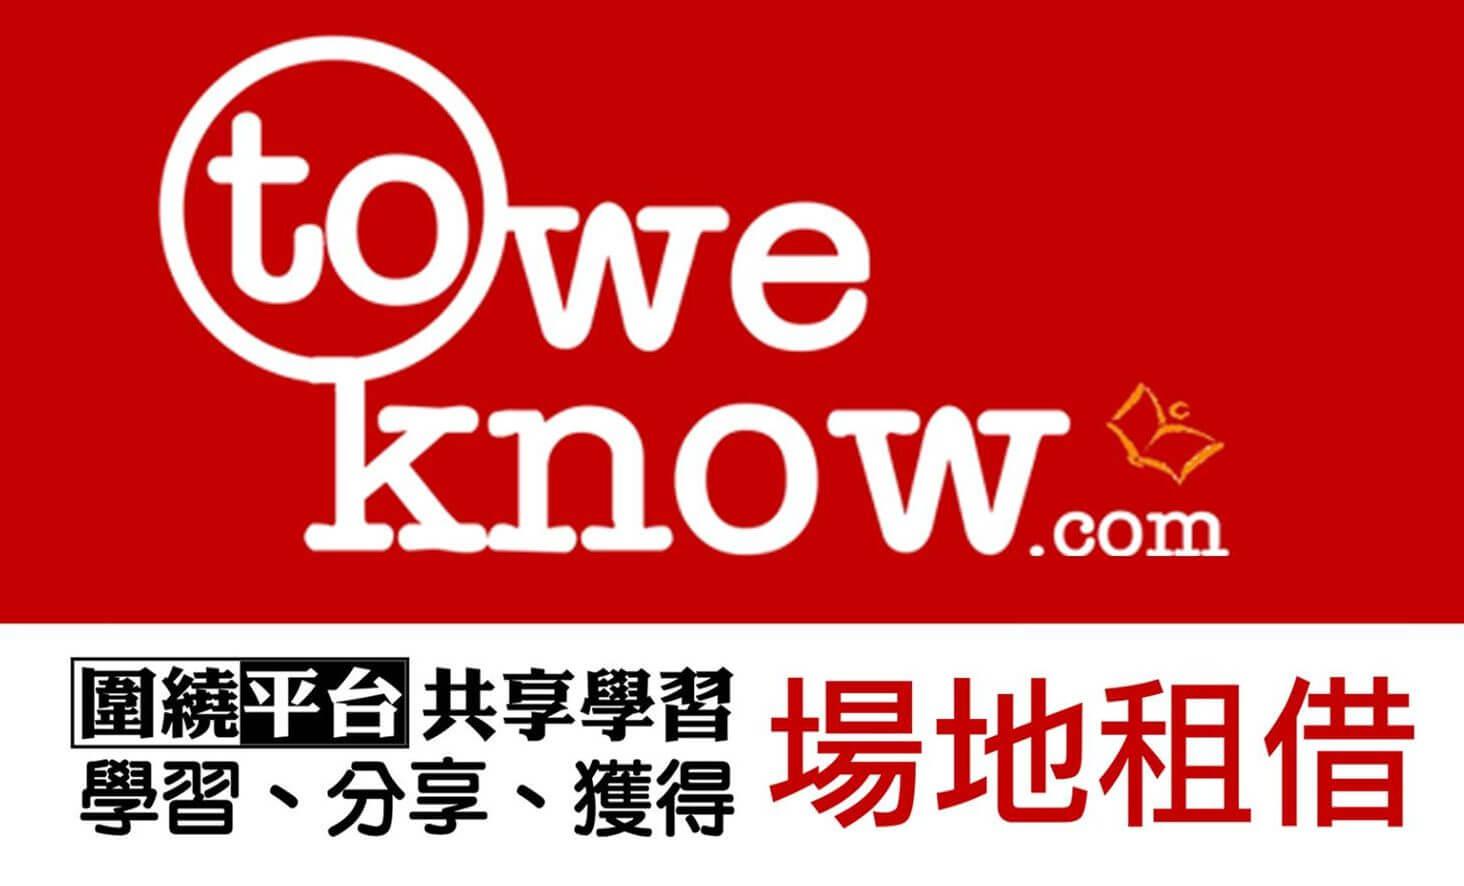 TowWeKnow卓越商務中心